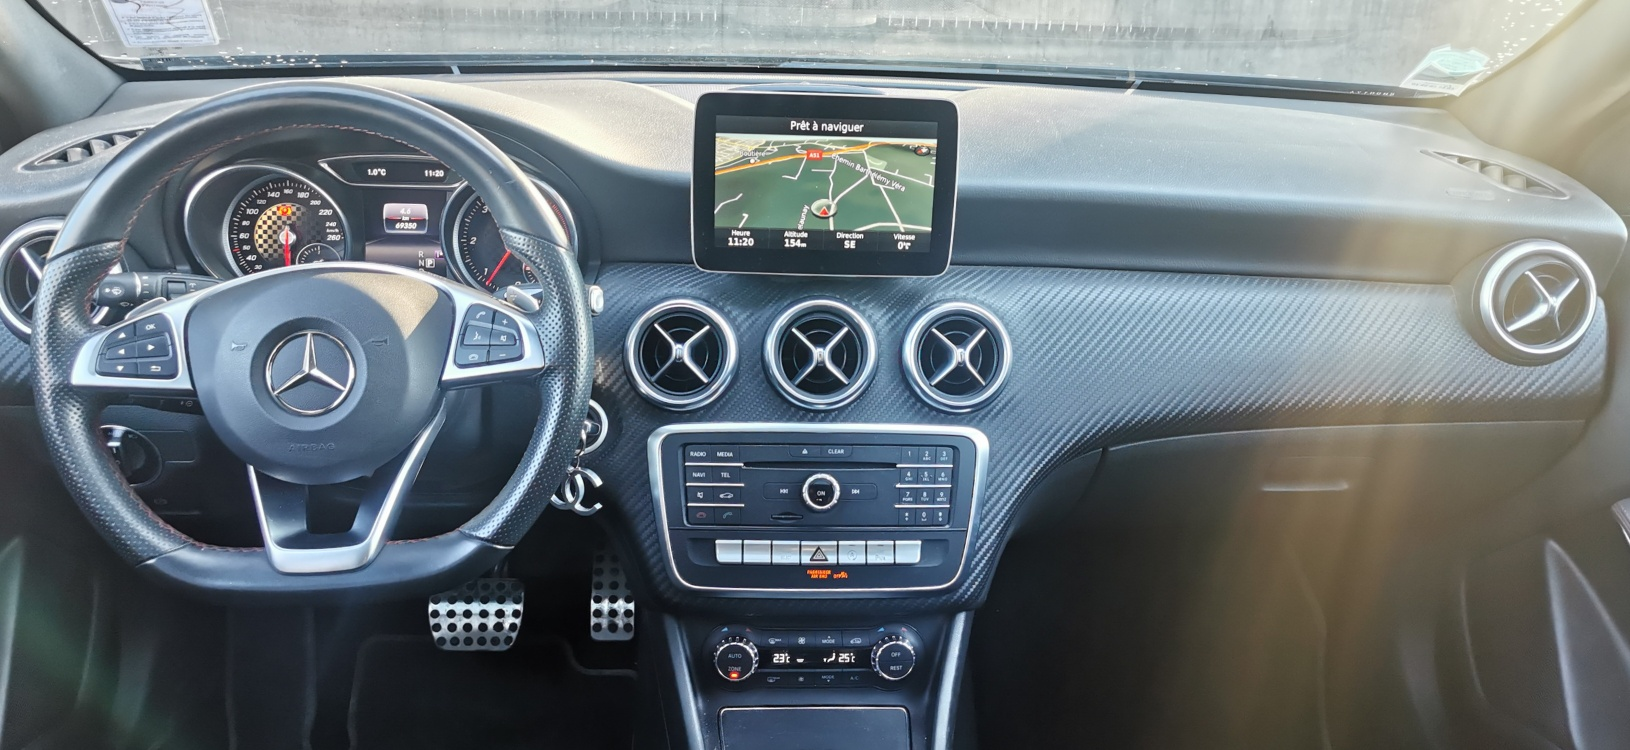 Mercedes Classe A 220d - Ellak Auto Sud